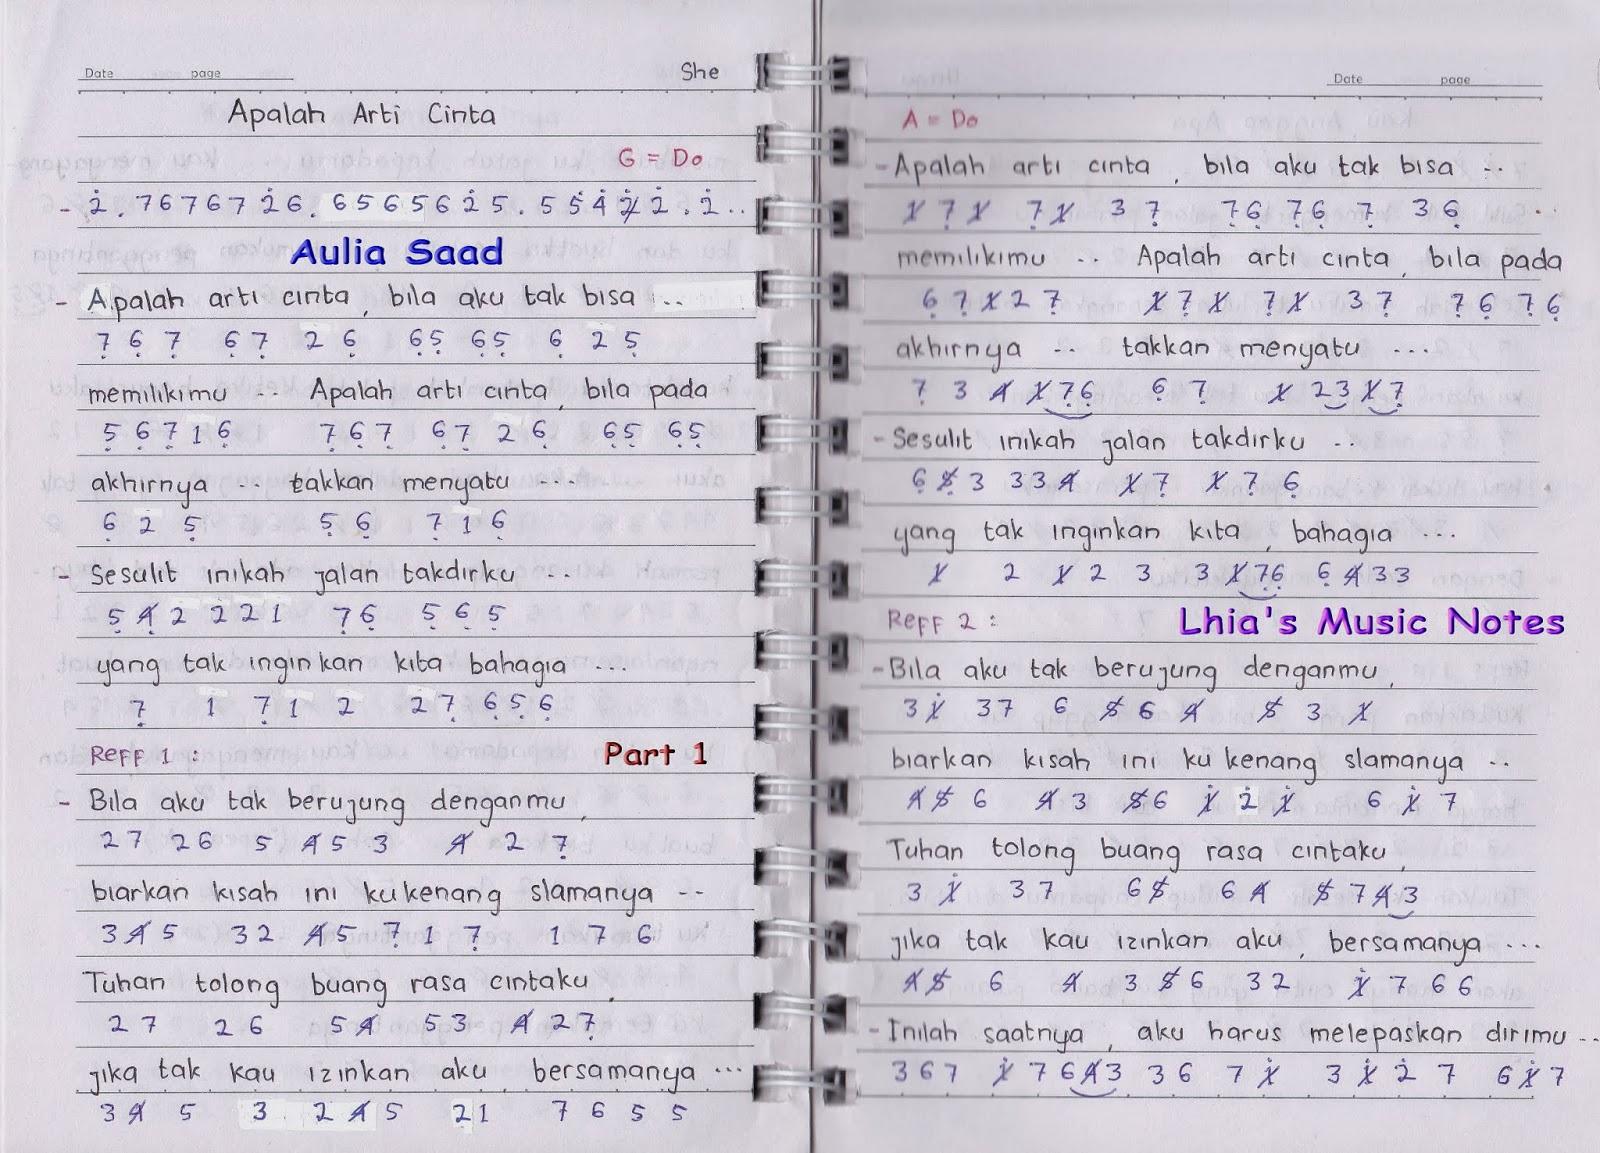 Not Angka : She – Apalah Arti Cinta | Lhia's Music Notes